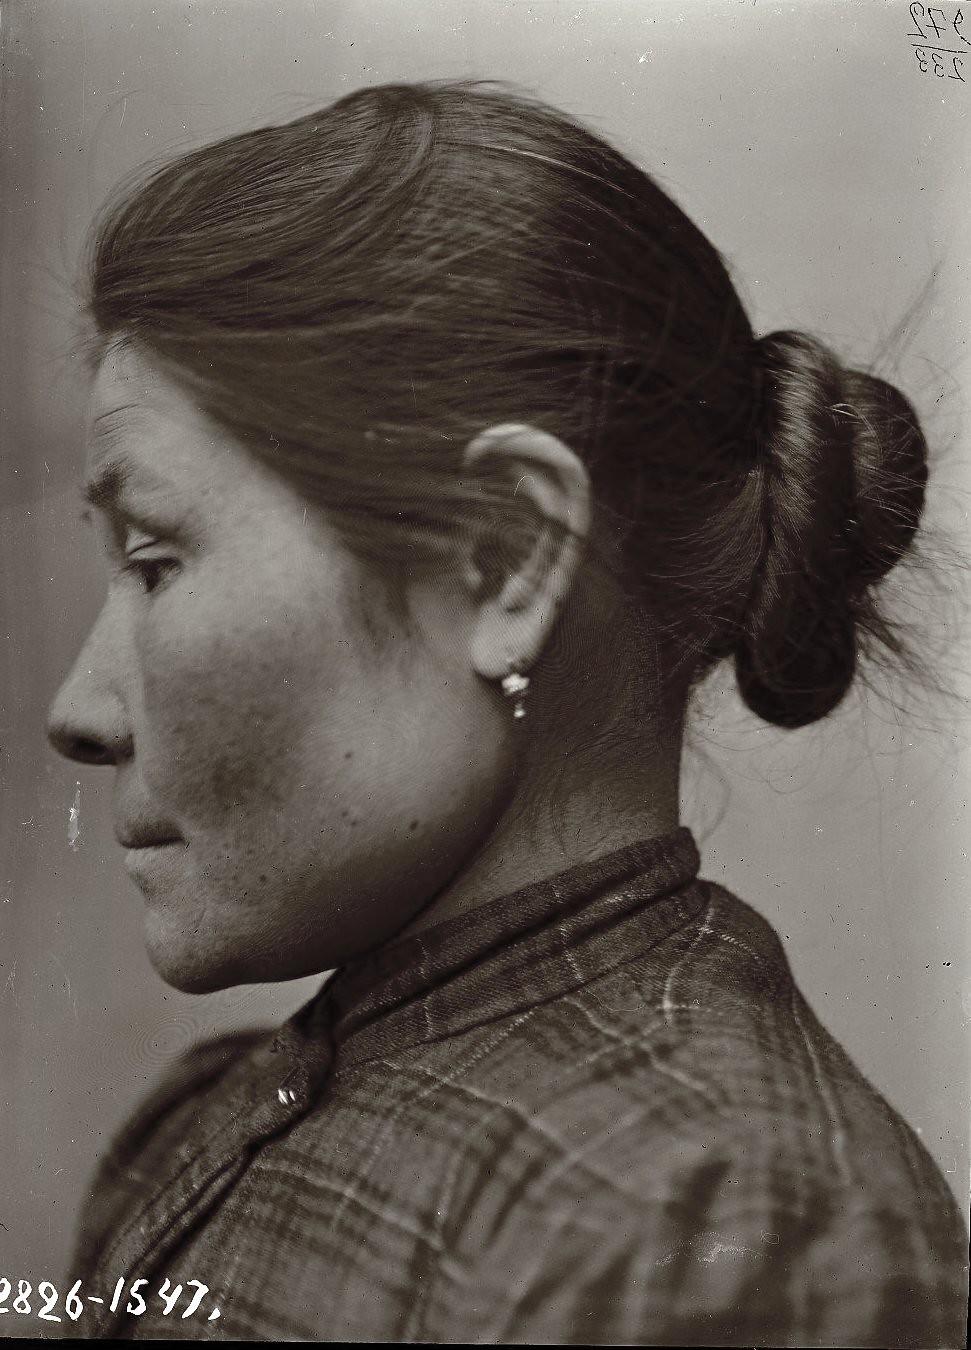 1909. Март - апрель. Аграфена Суворова (профиль). Алеутские острова, Умнак остров